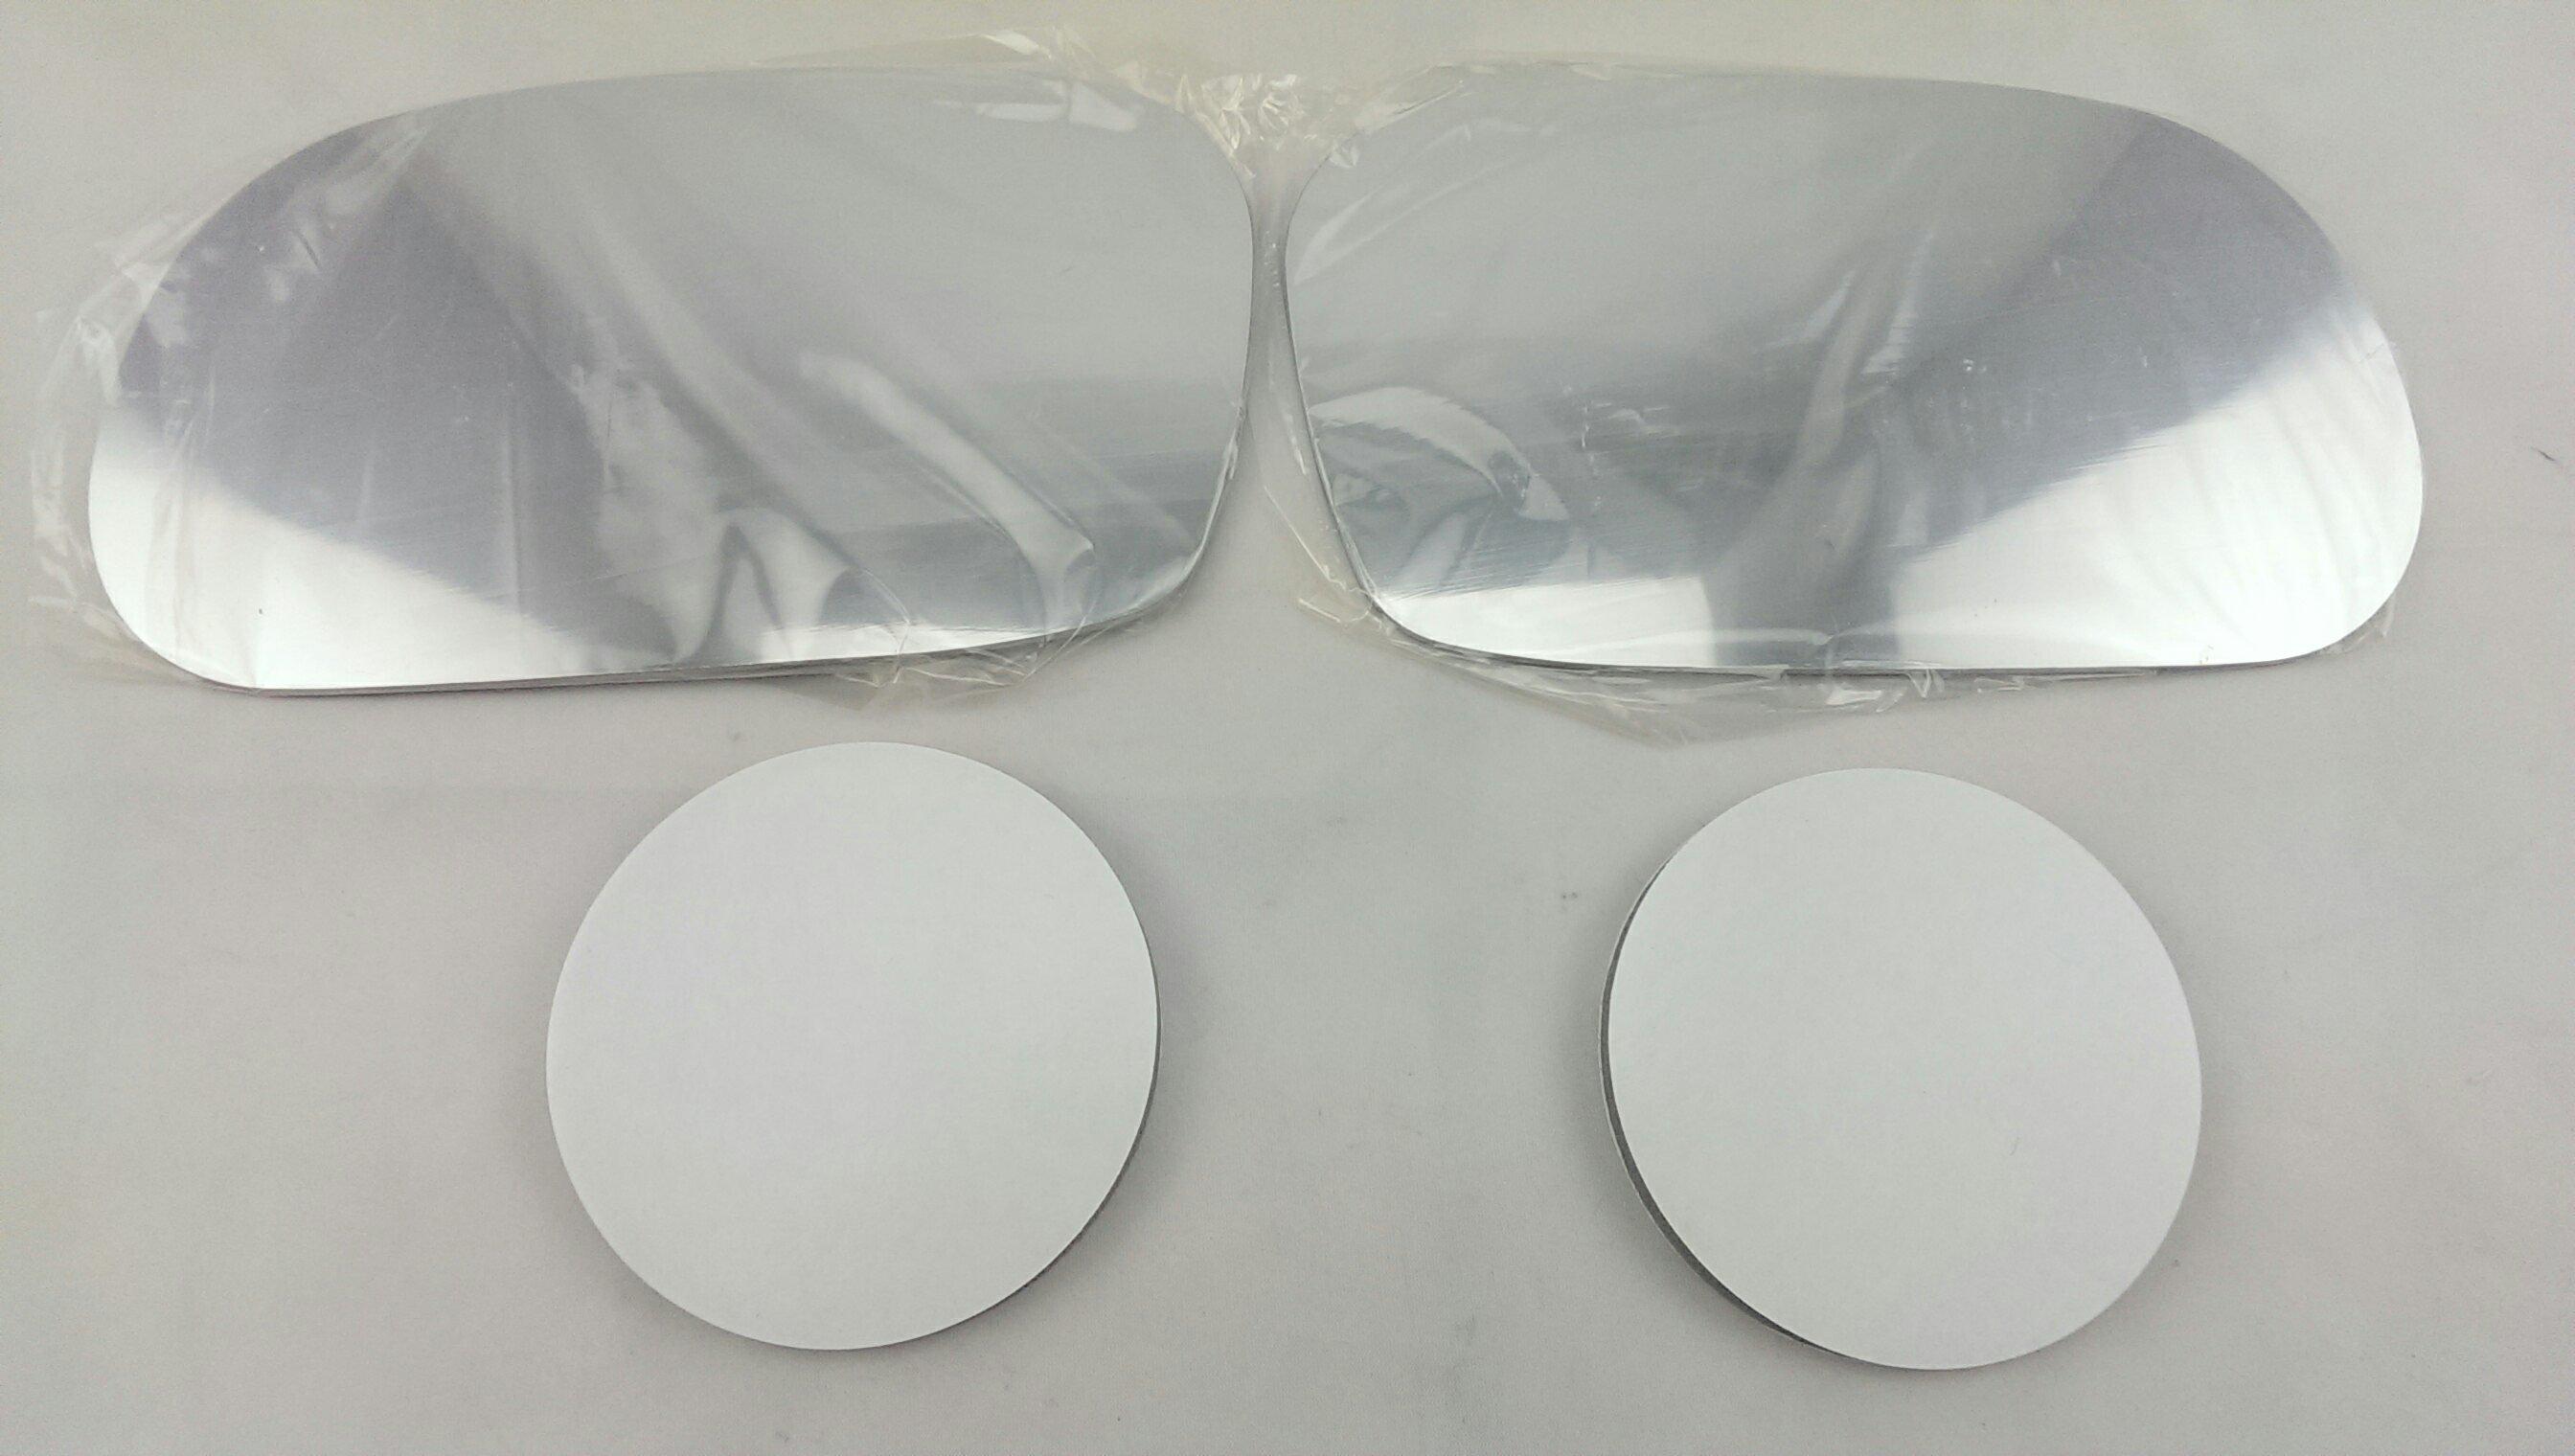 *HDS*速霸陸 IMPREZA(台規) 硬皮鯊 白鉻鏡片(一組 左 右 貼黏式) 後視鏡片 後照鏡片 後視鏡玻璃